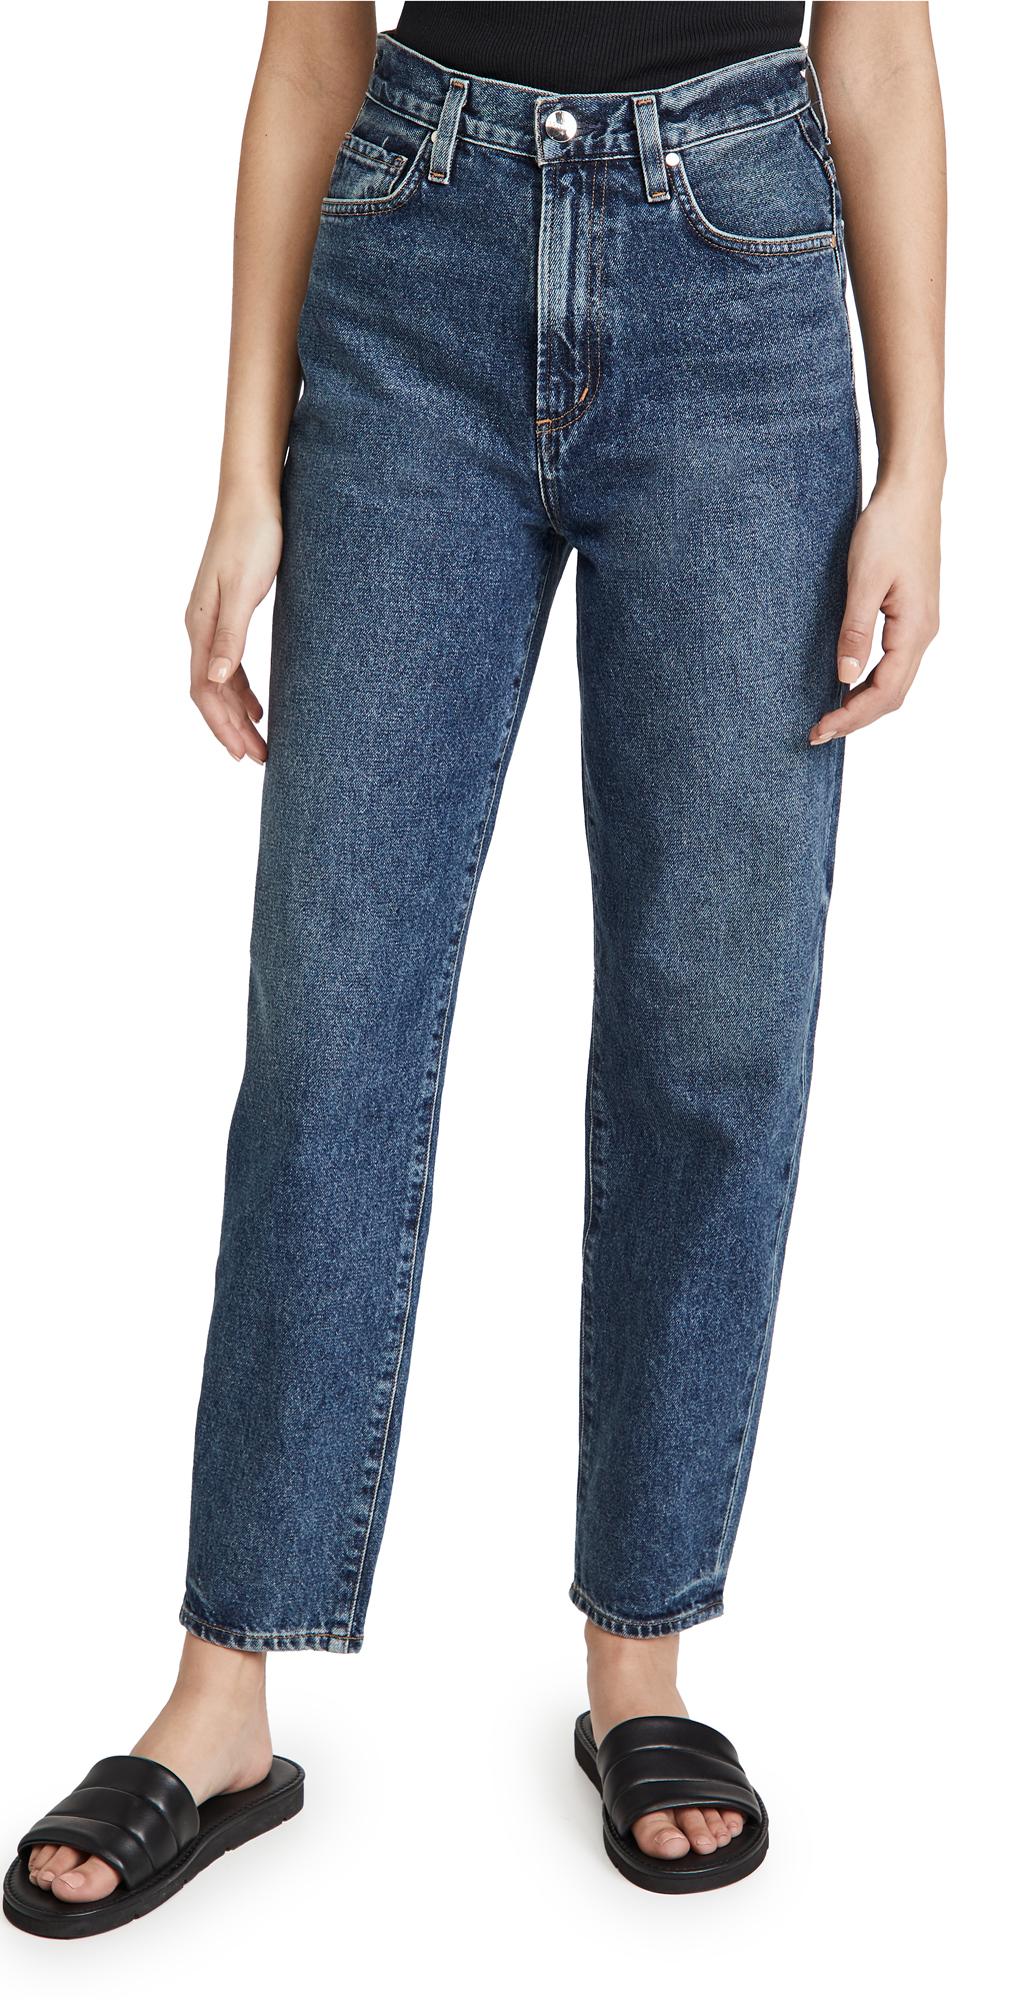 The Peg Jeans